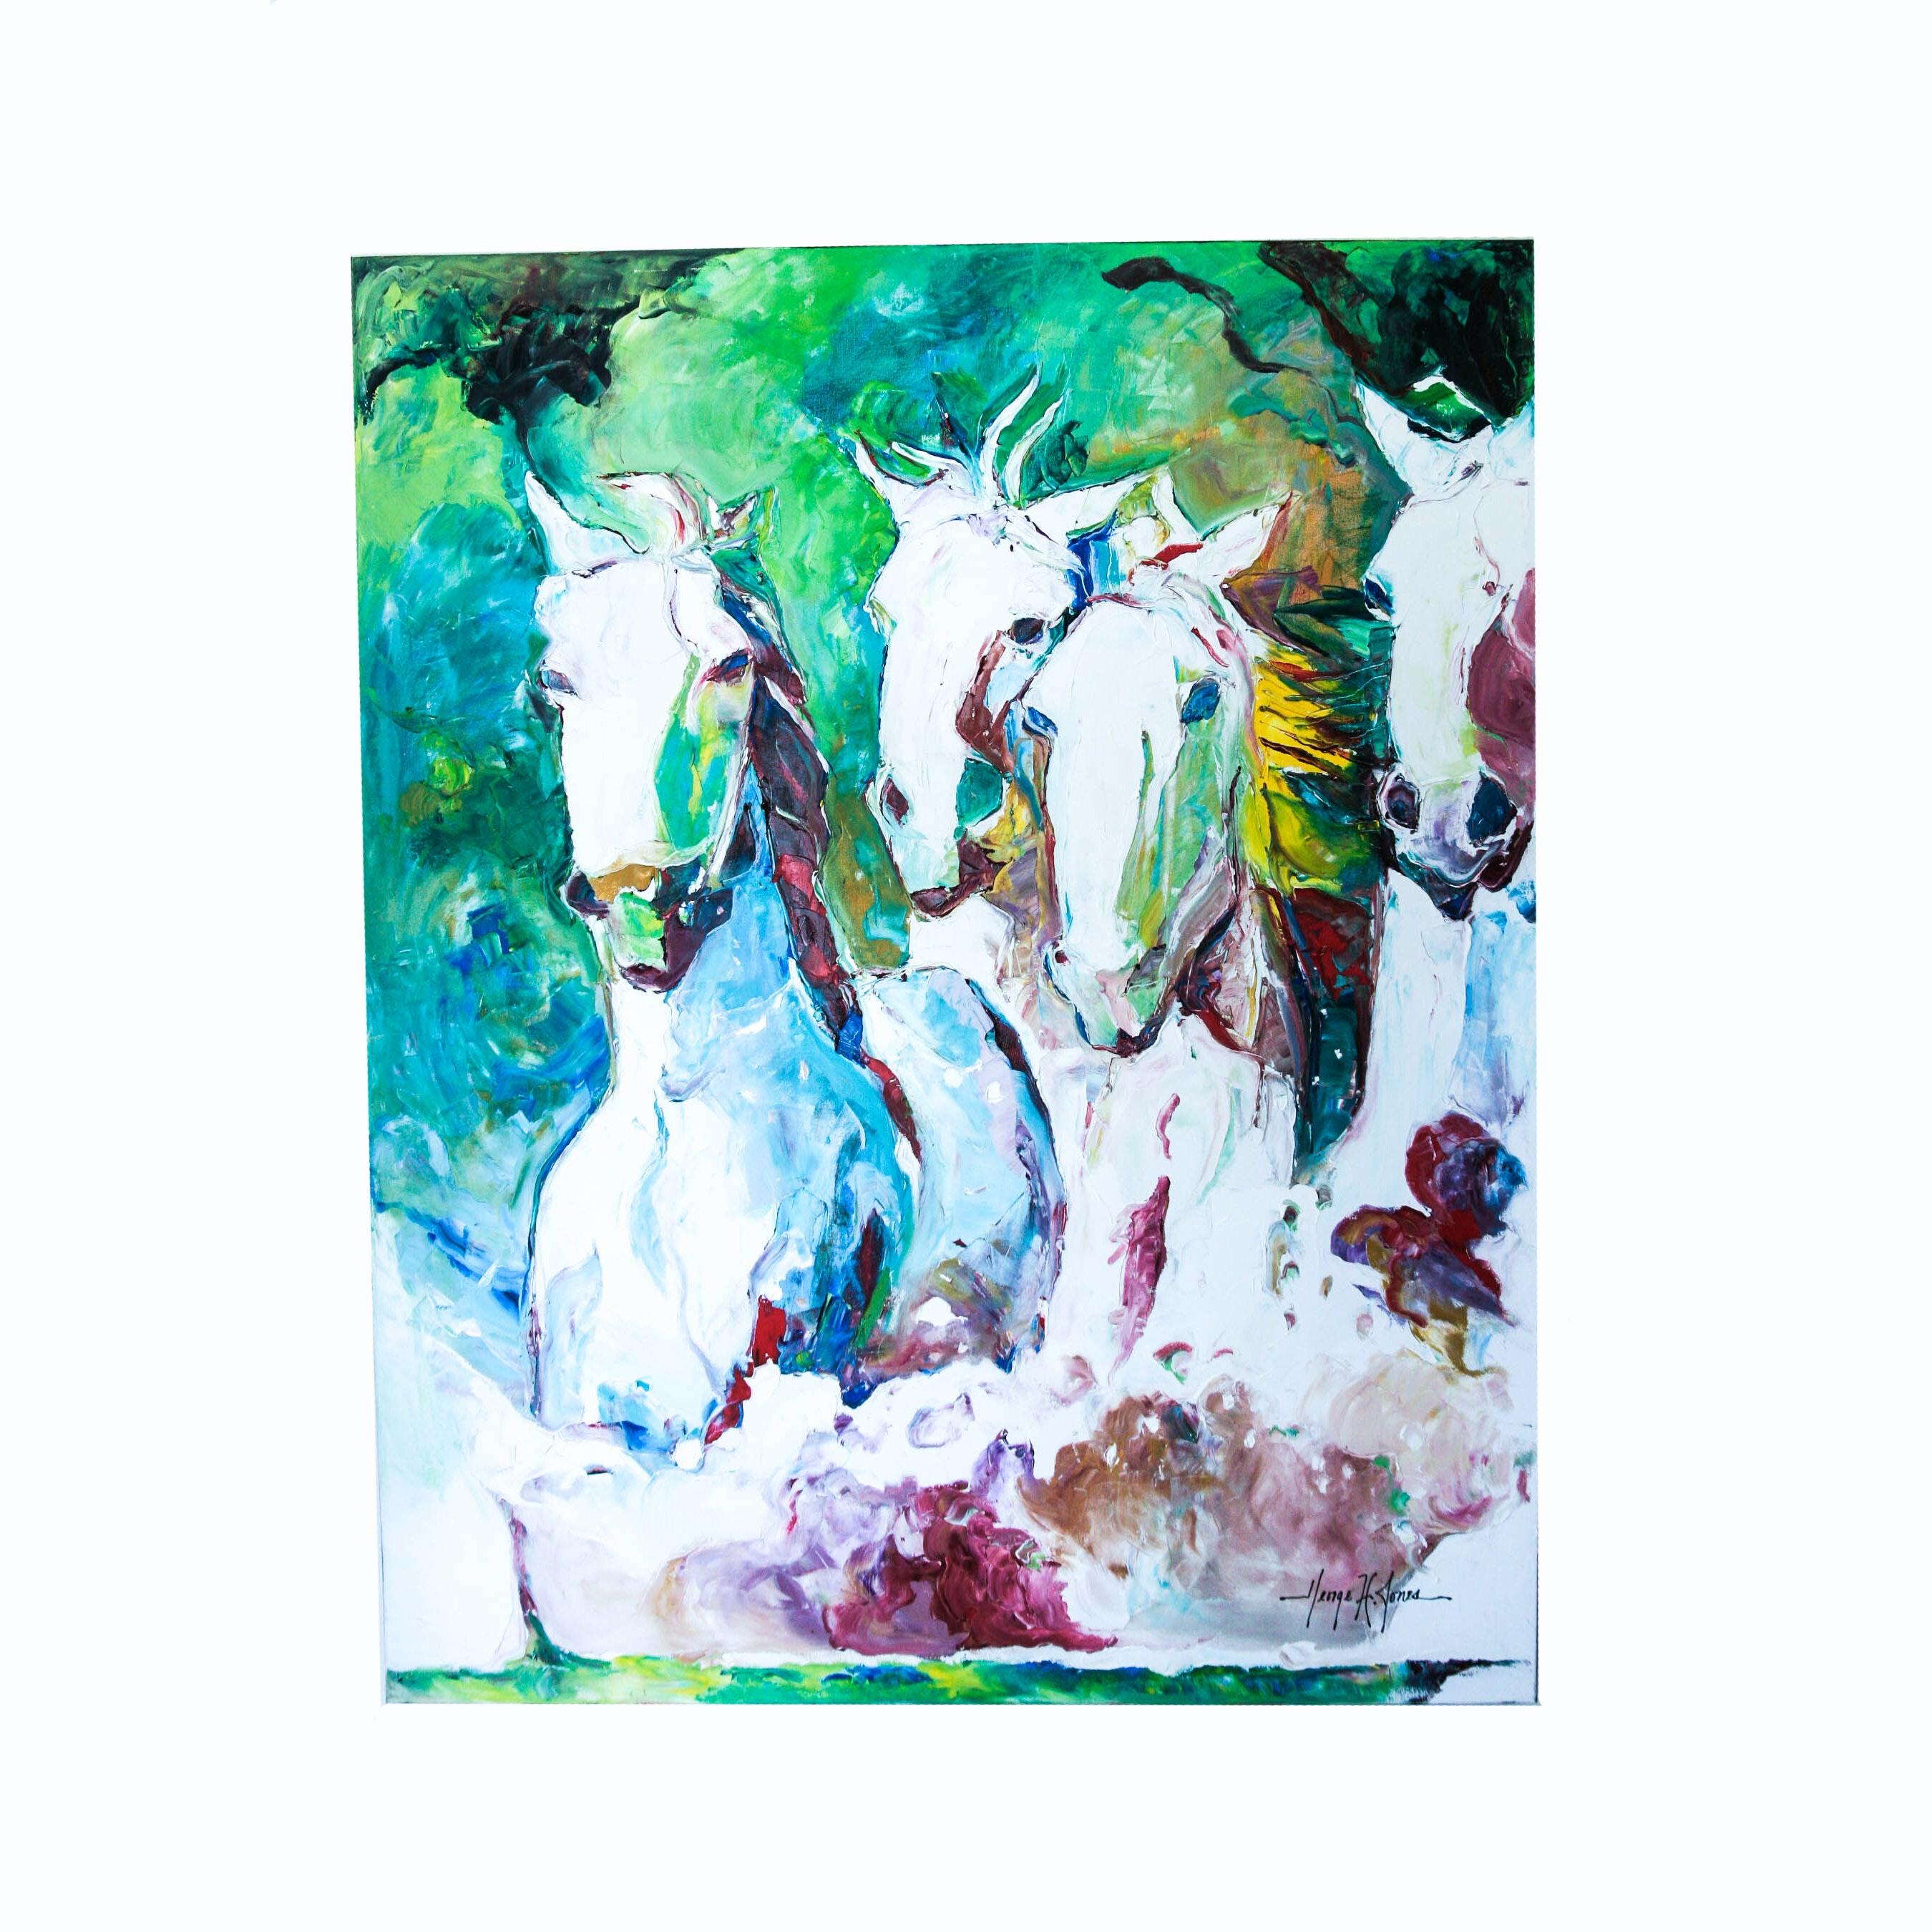 """Teamwork"" Oil on Canvas by George H. Jones"